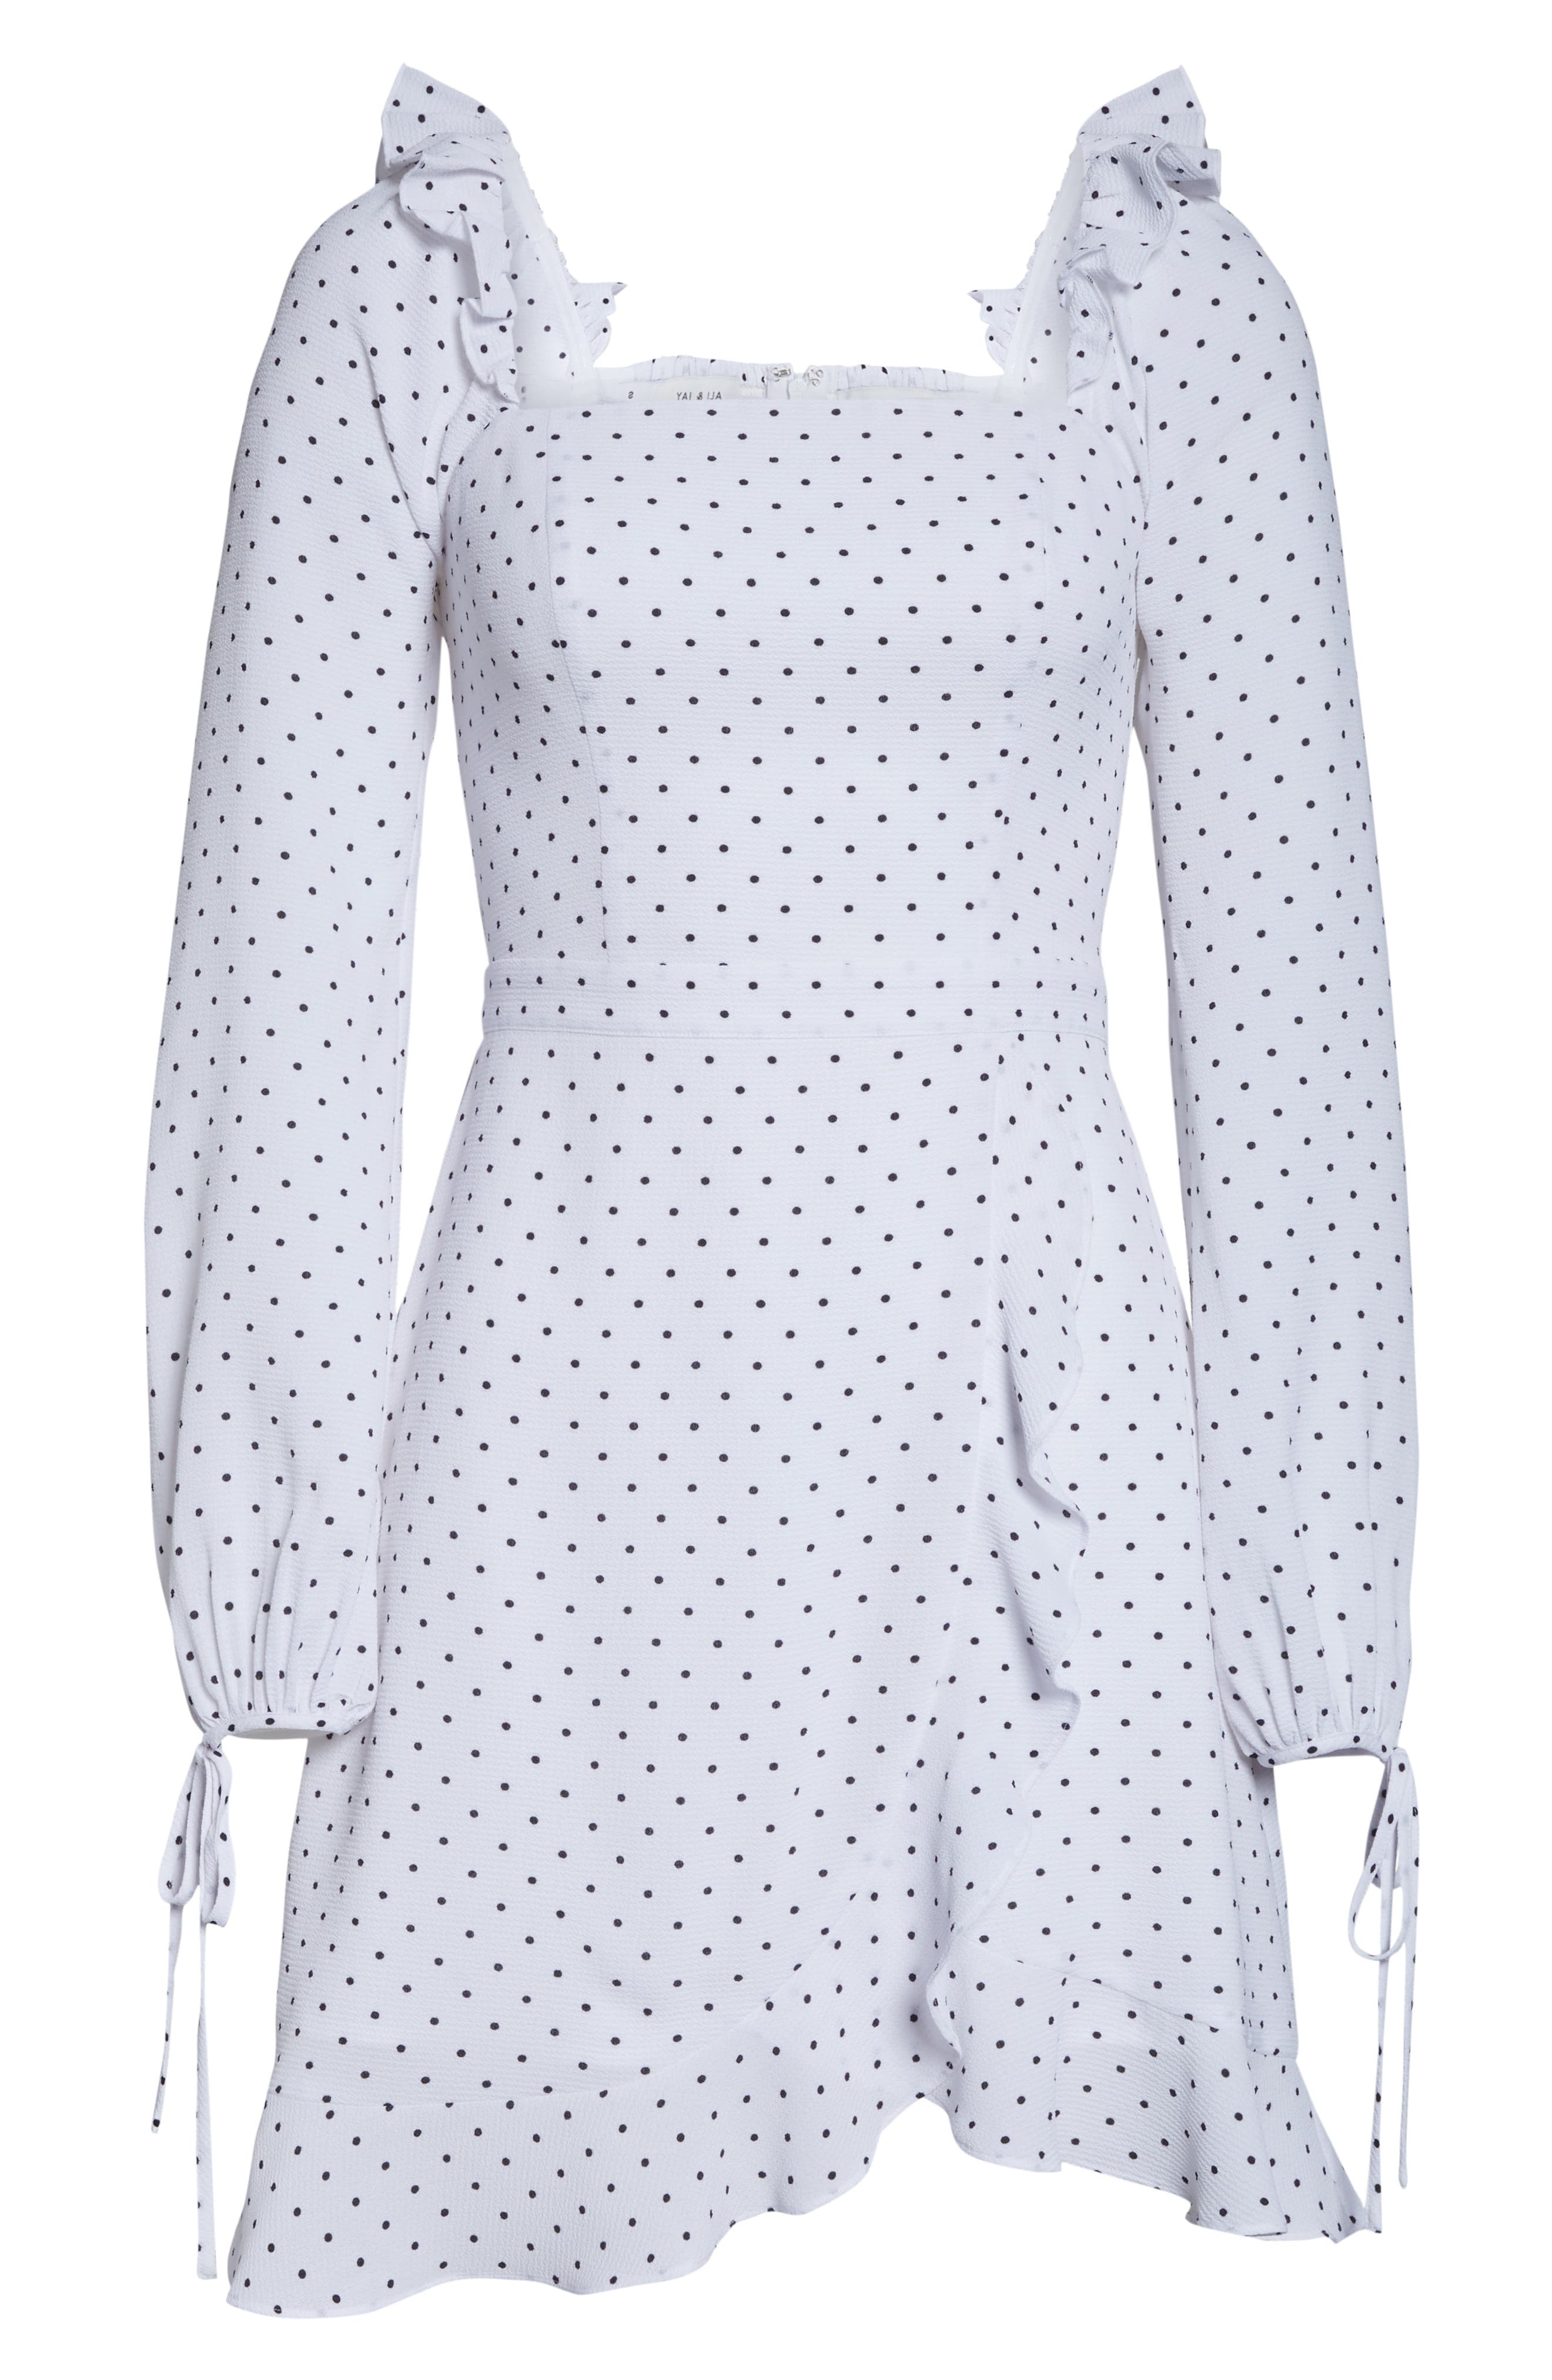 ALI & JAY, In Bloom Polka Dot Asymmetrical Dress, Alternate thumbnail 7, color, 100